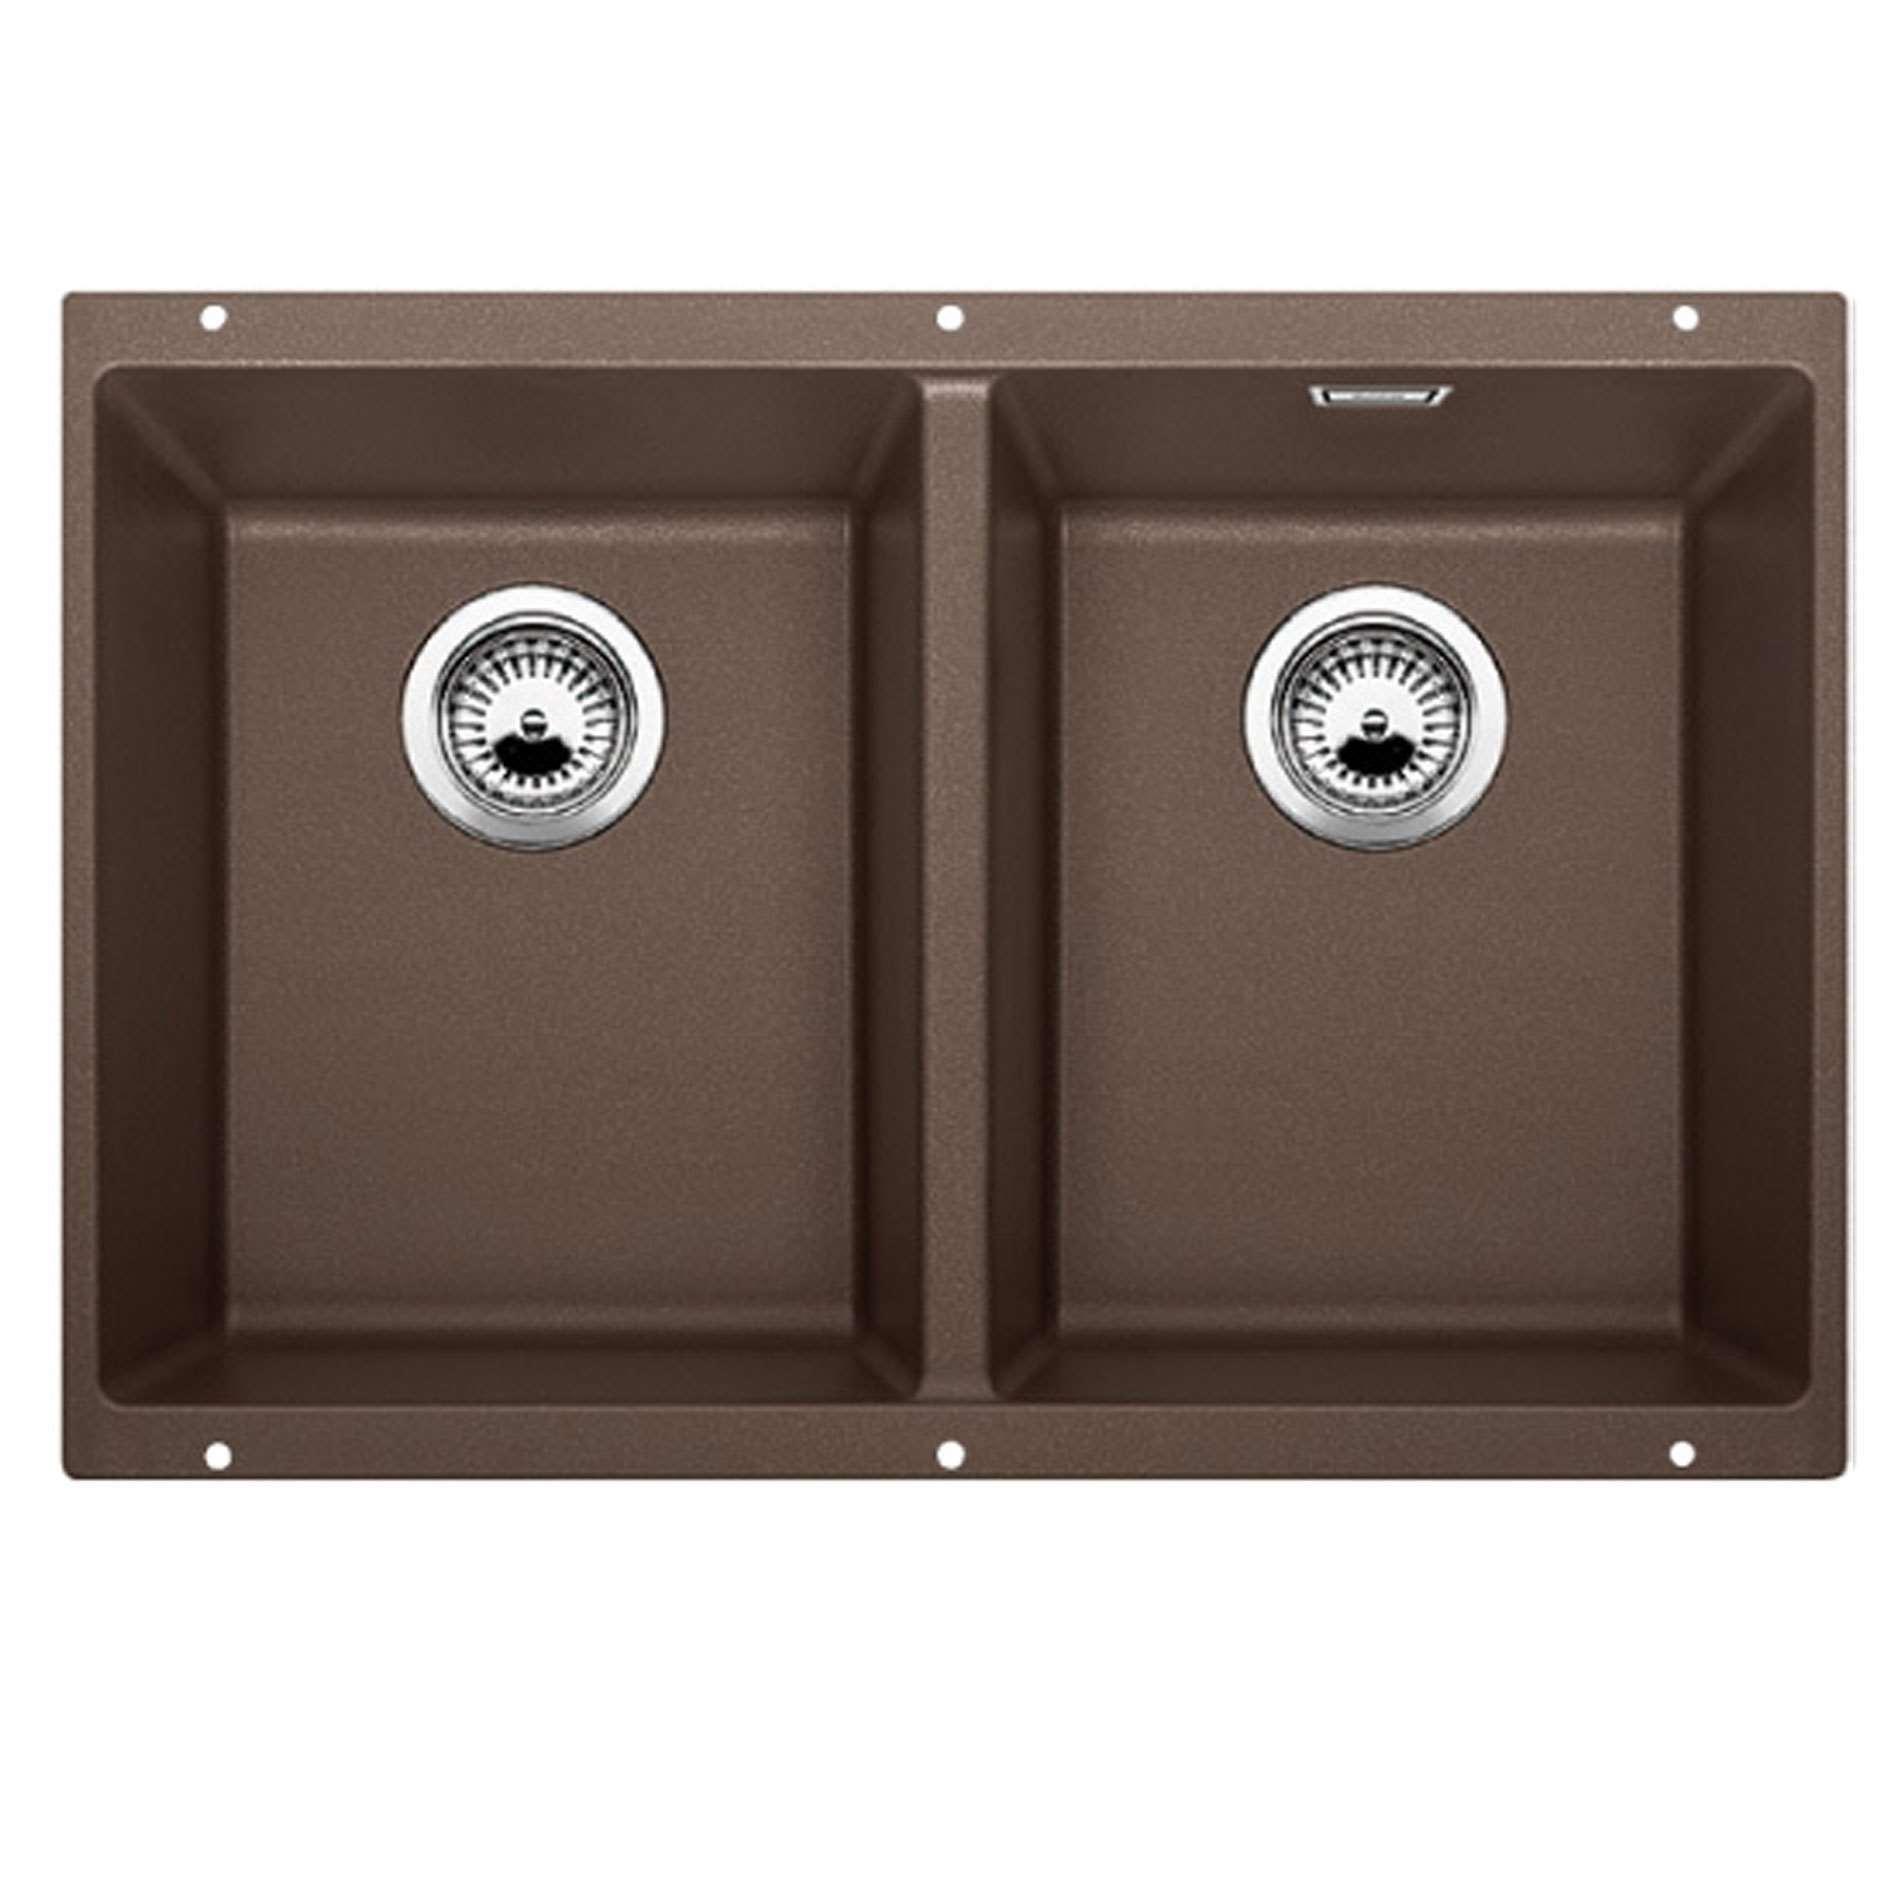 blanco subline 350 350 u coffee silgranit sink kitchen. Black Bedroom Furniture Sets. Home Design Ideas